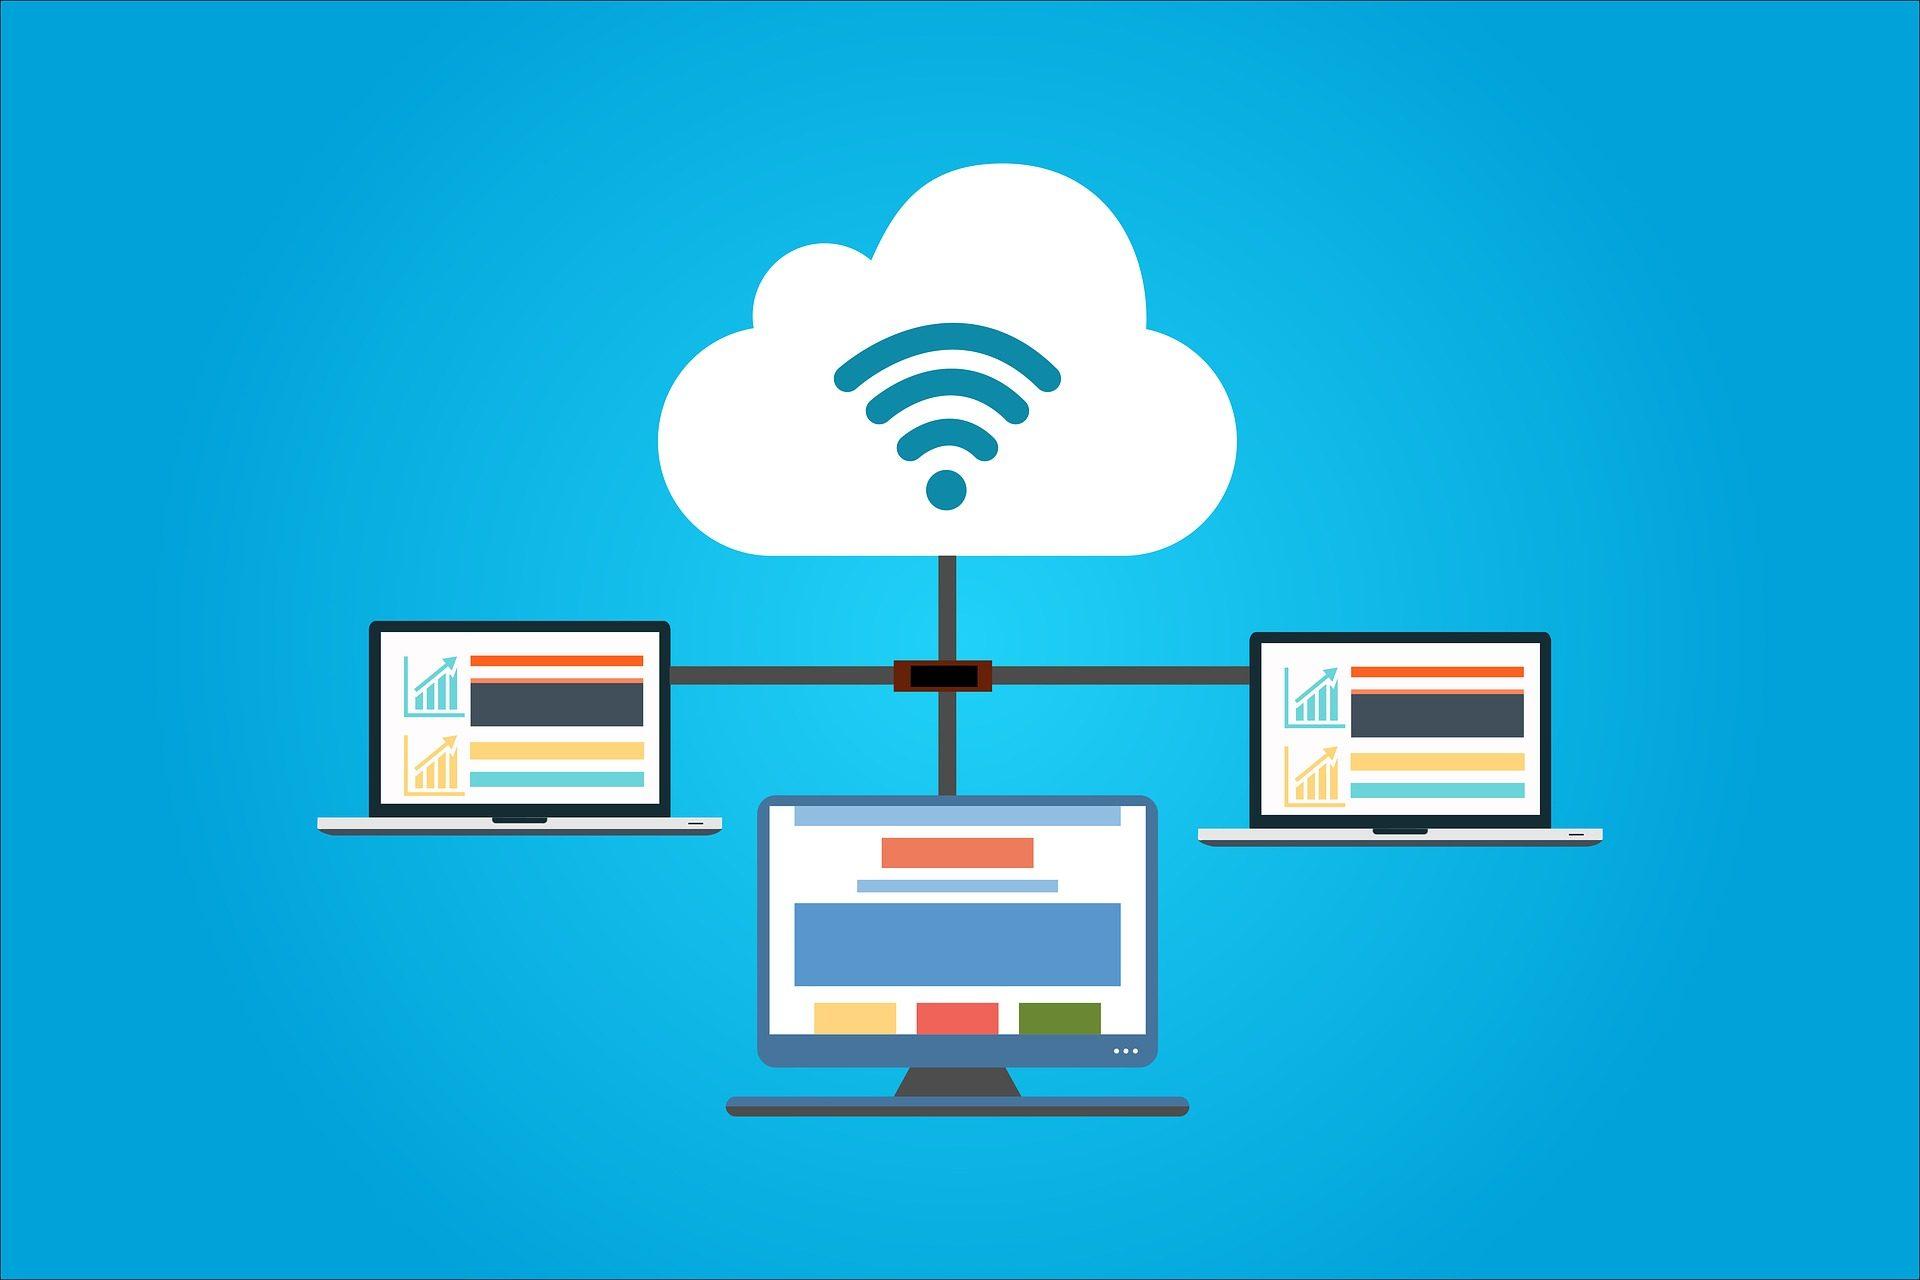 Cloud computing? Differenza tra public, private e hybrid. Focus su IaaS, PaaS e SaaS